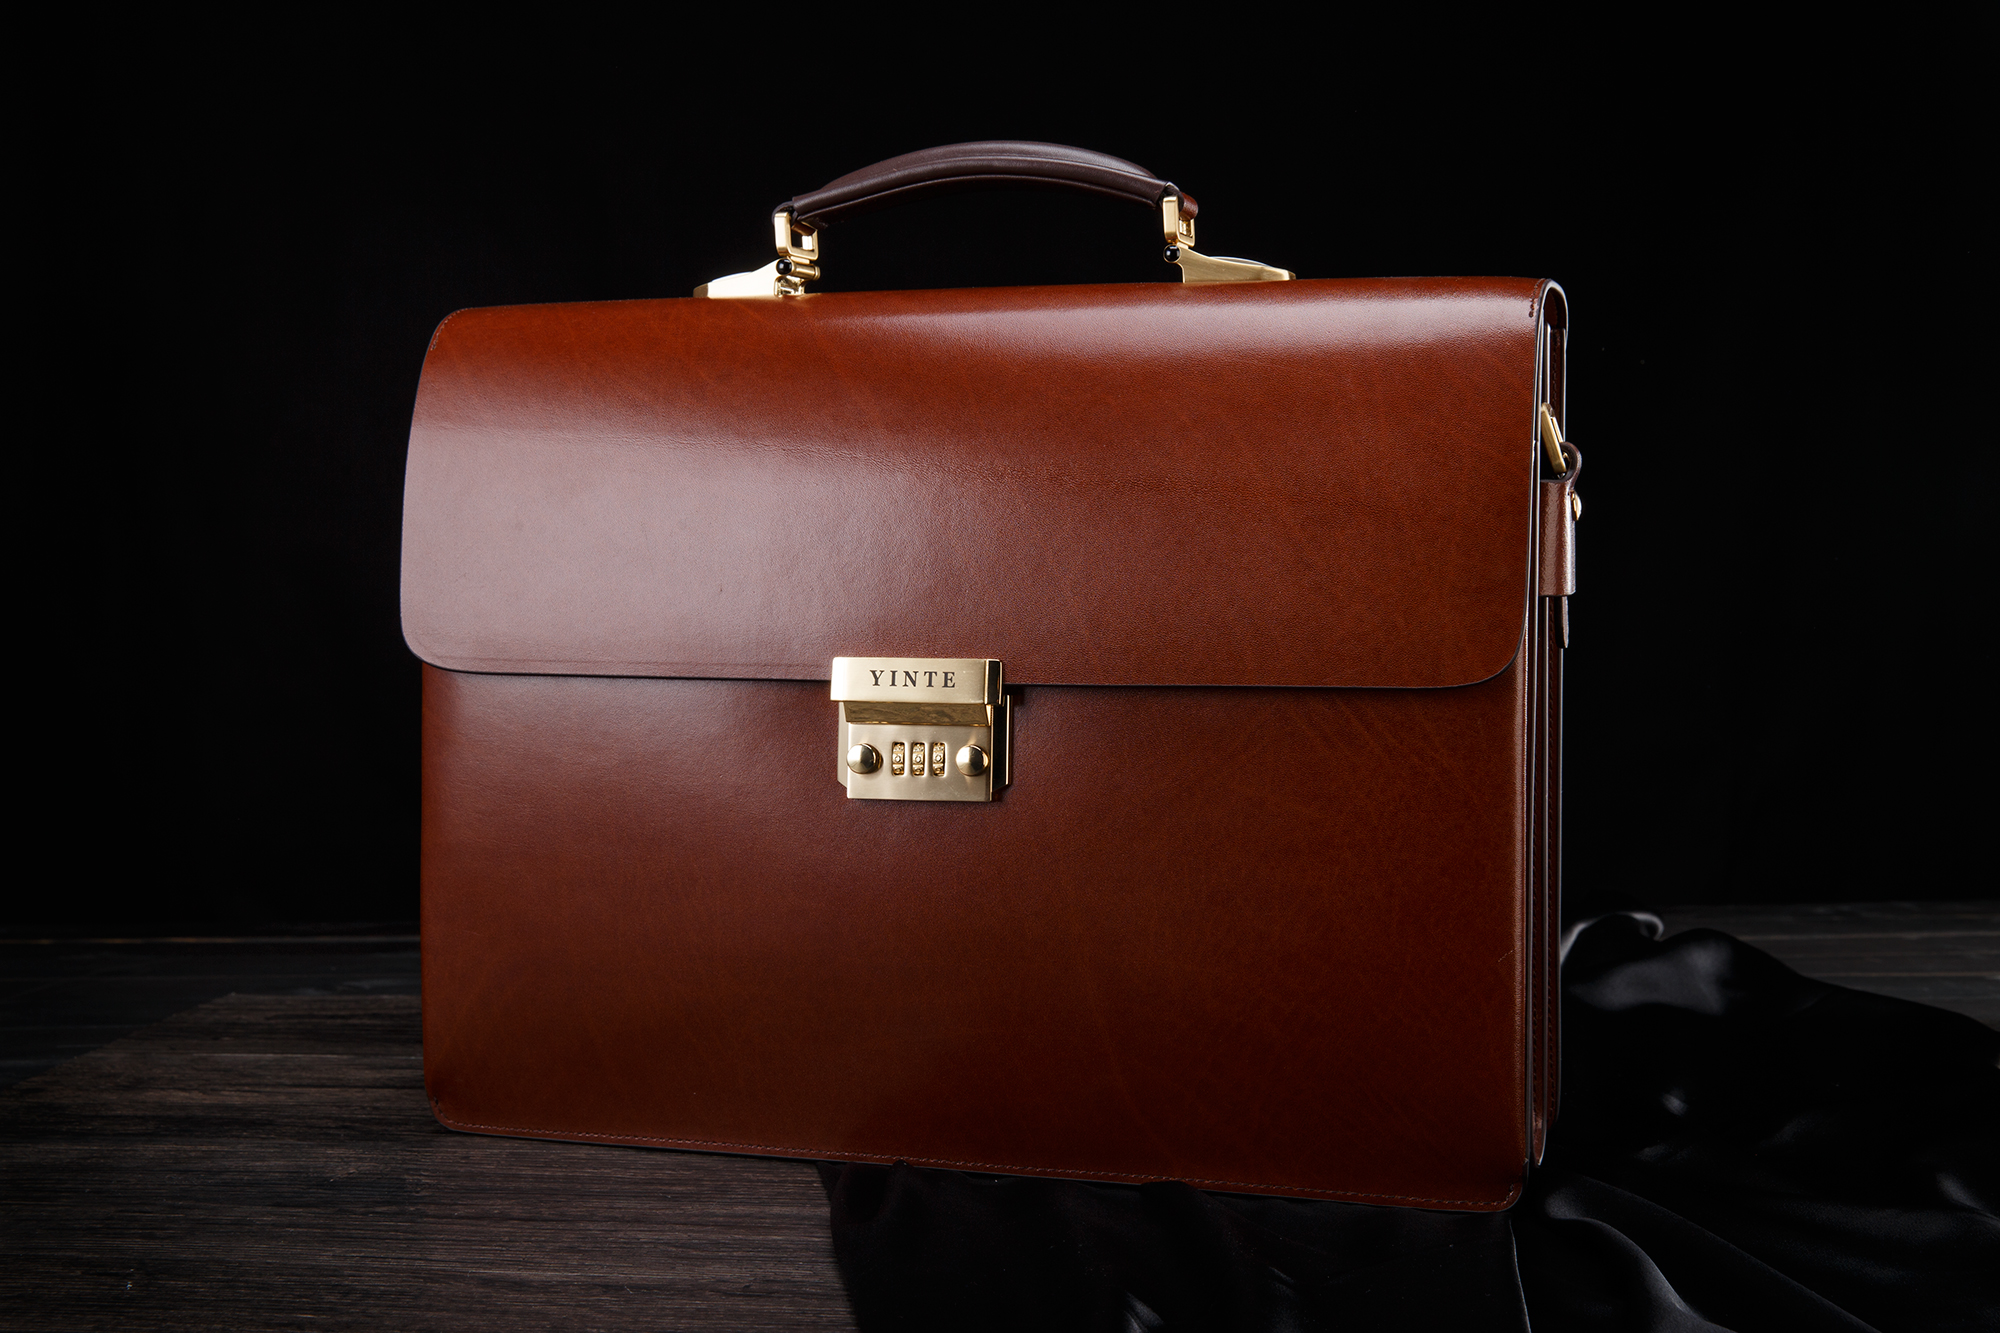 1249f5b60bb95 YINTE Leder herren Aktentasche Leder Business Tasche männer Laptop Tasche  Anwalt Handtasche Dokument Dicker Männer Totes Portfolio T8191 6 in YINTE  Leder ...